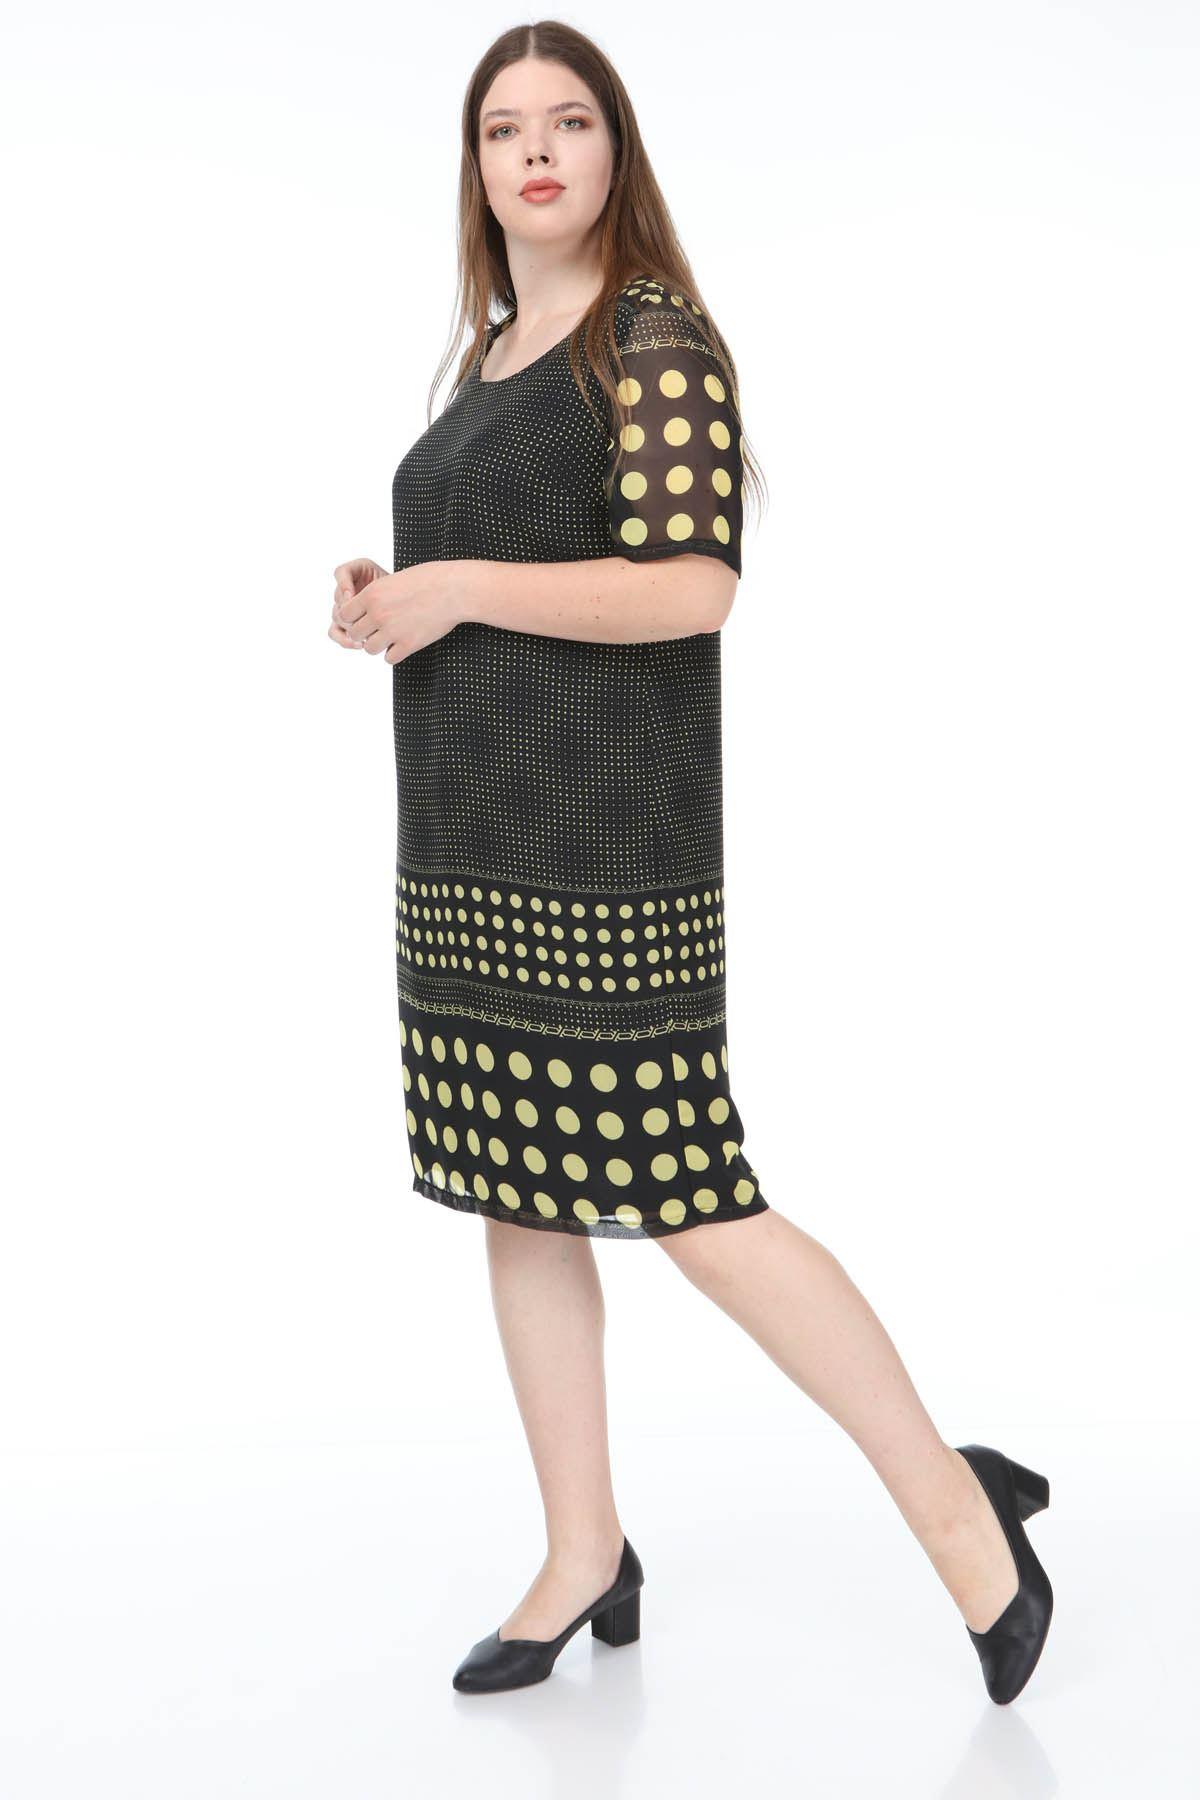 Puanlı Şifon Elbise F3-1179